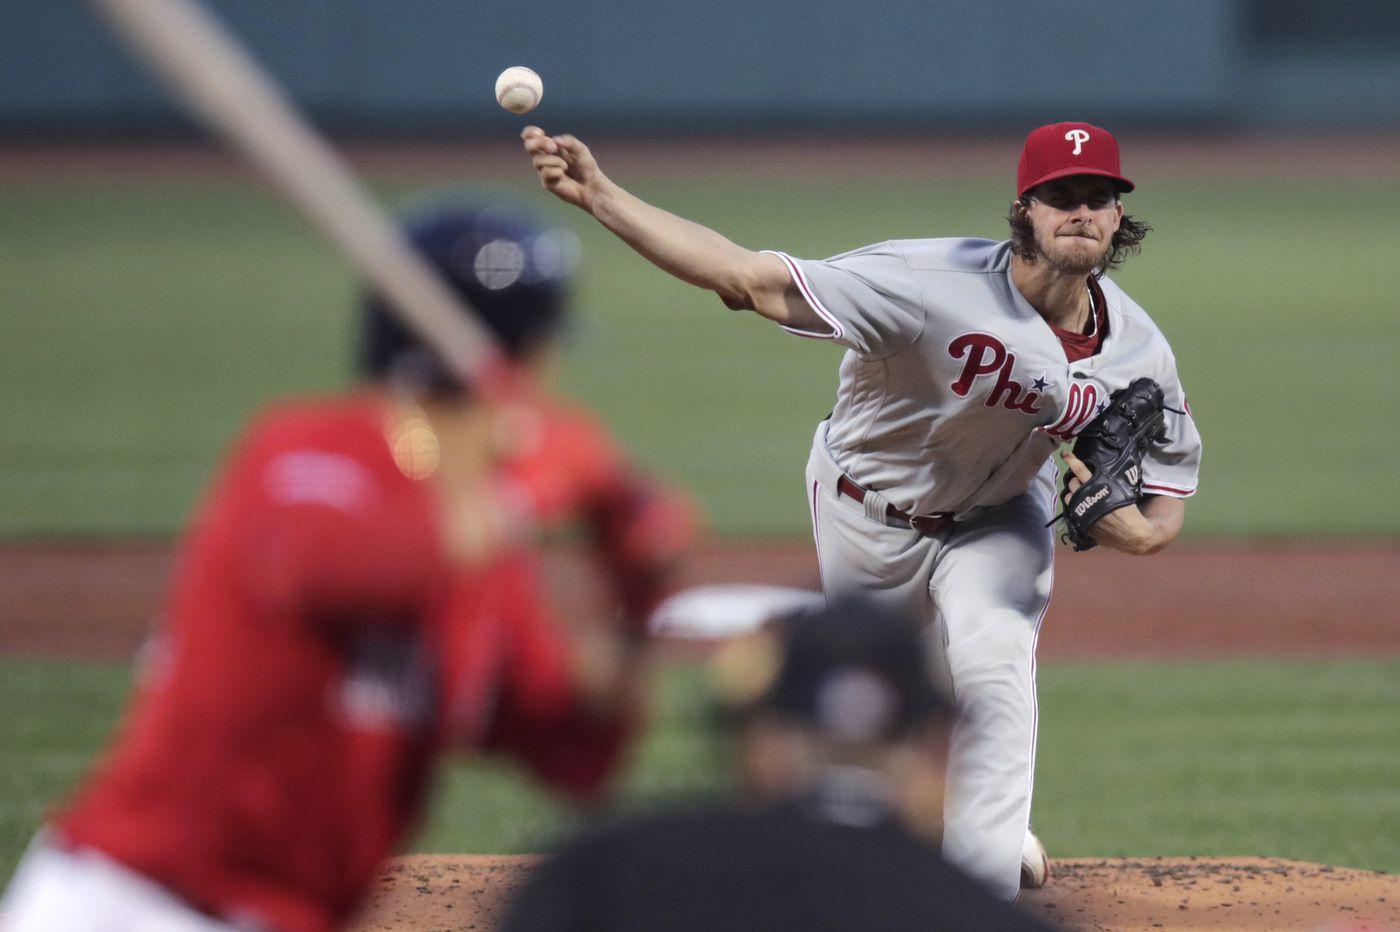 Aaron Nola, reliever Mike Morin lift Phillies over Red Sox in series opener